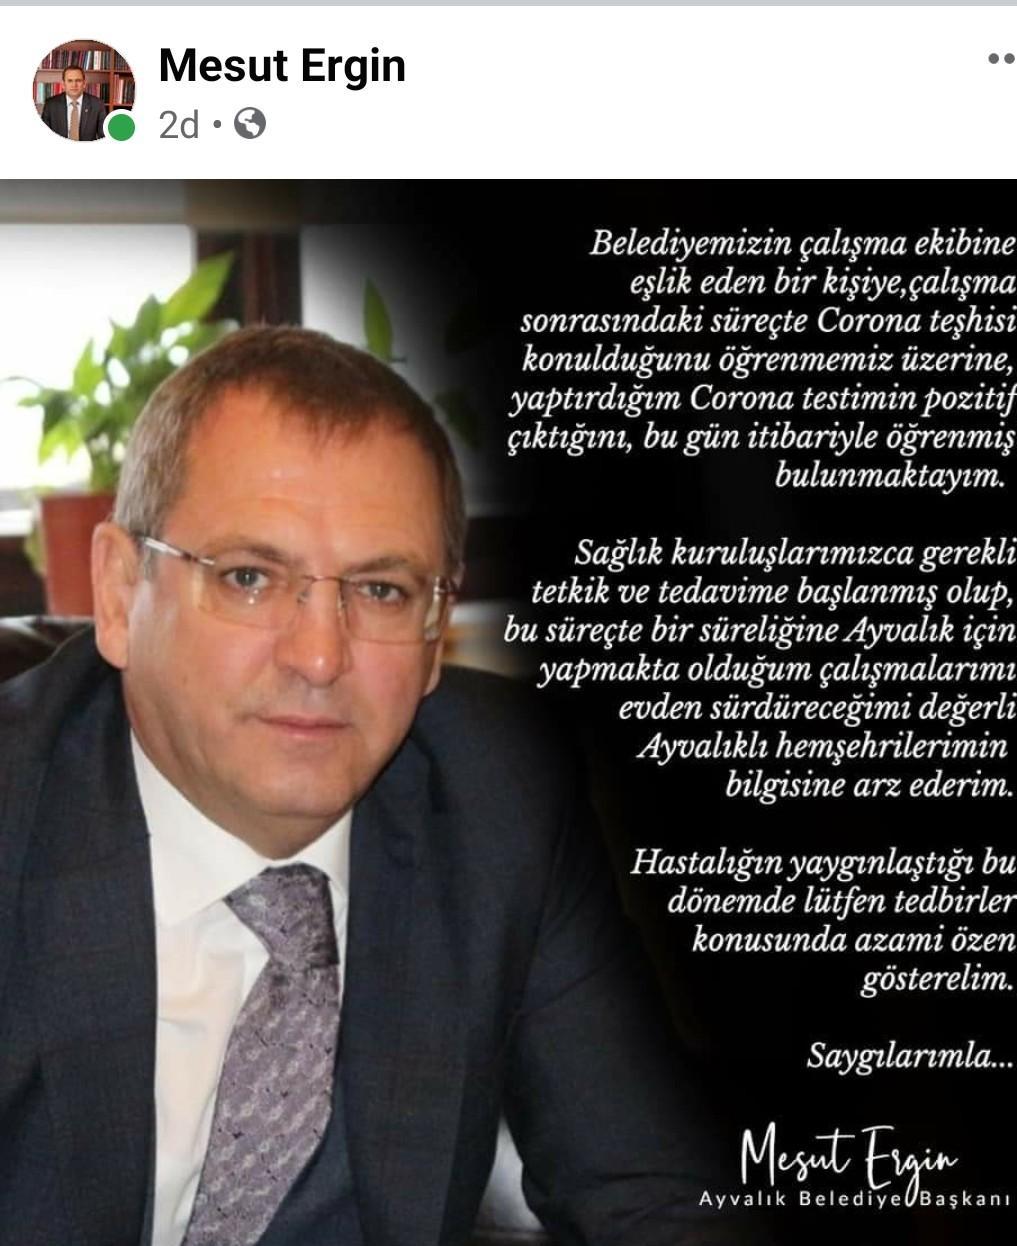 MESUT ERGİN'İN KORONA TESTİ POZİTİF